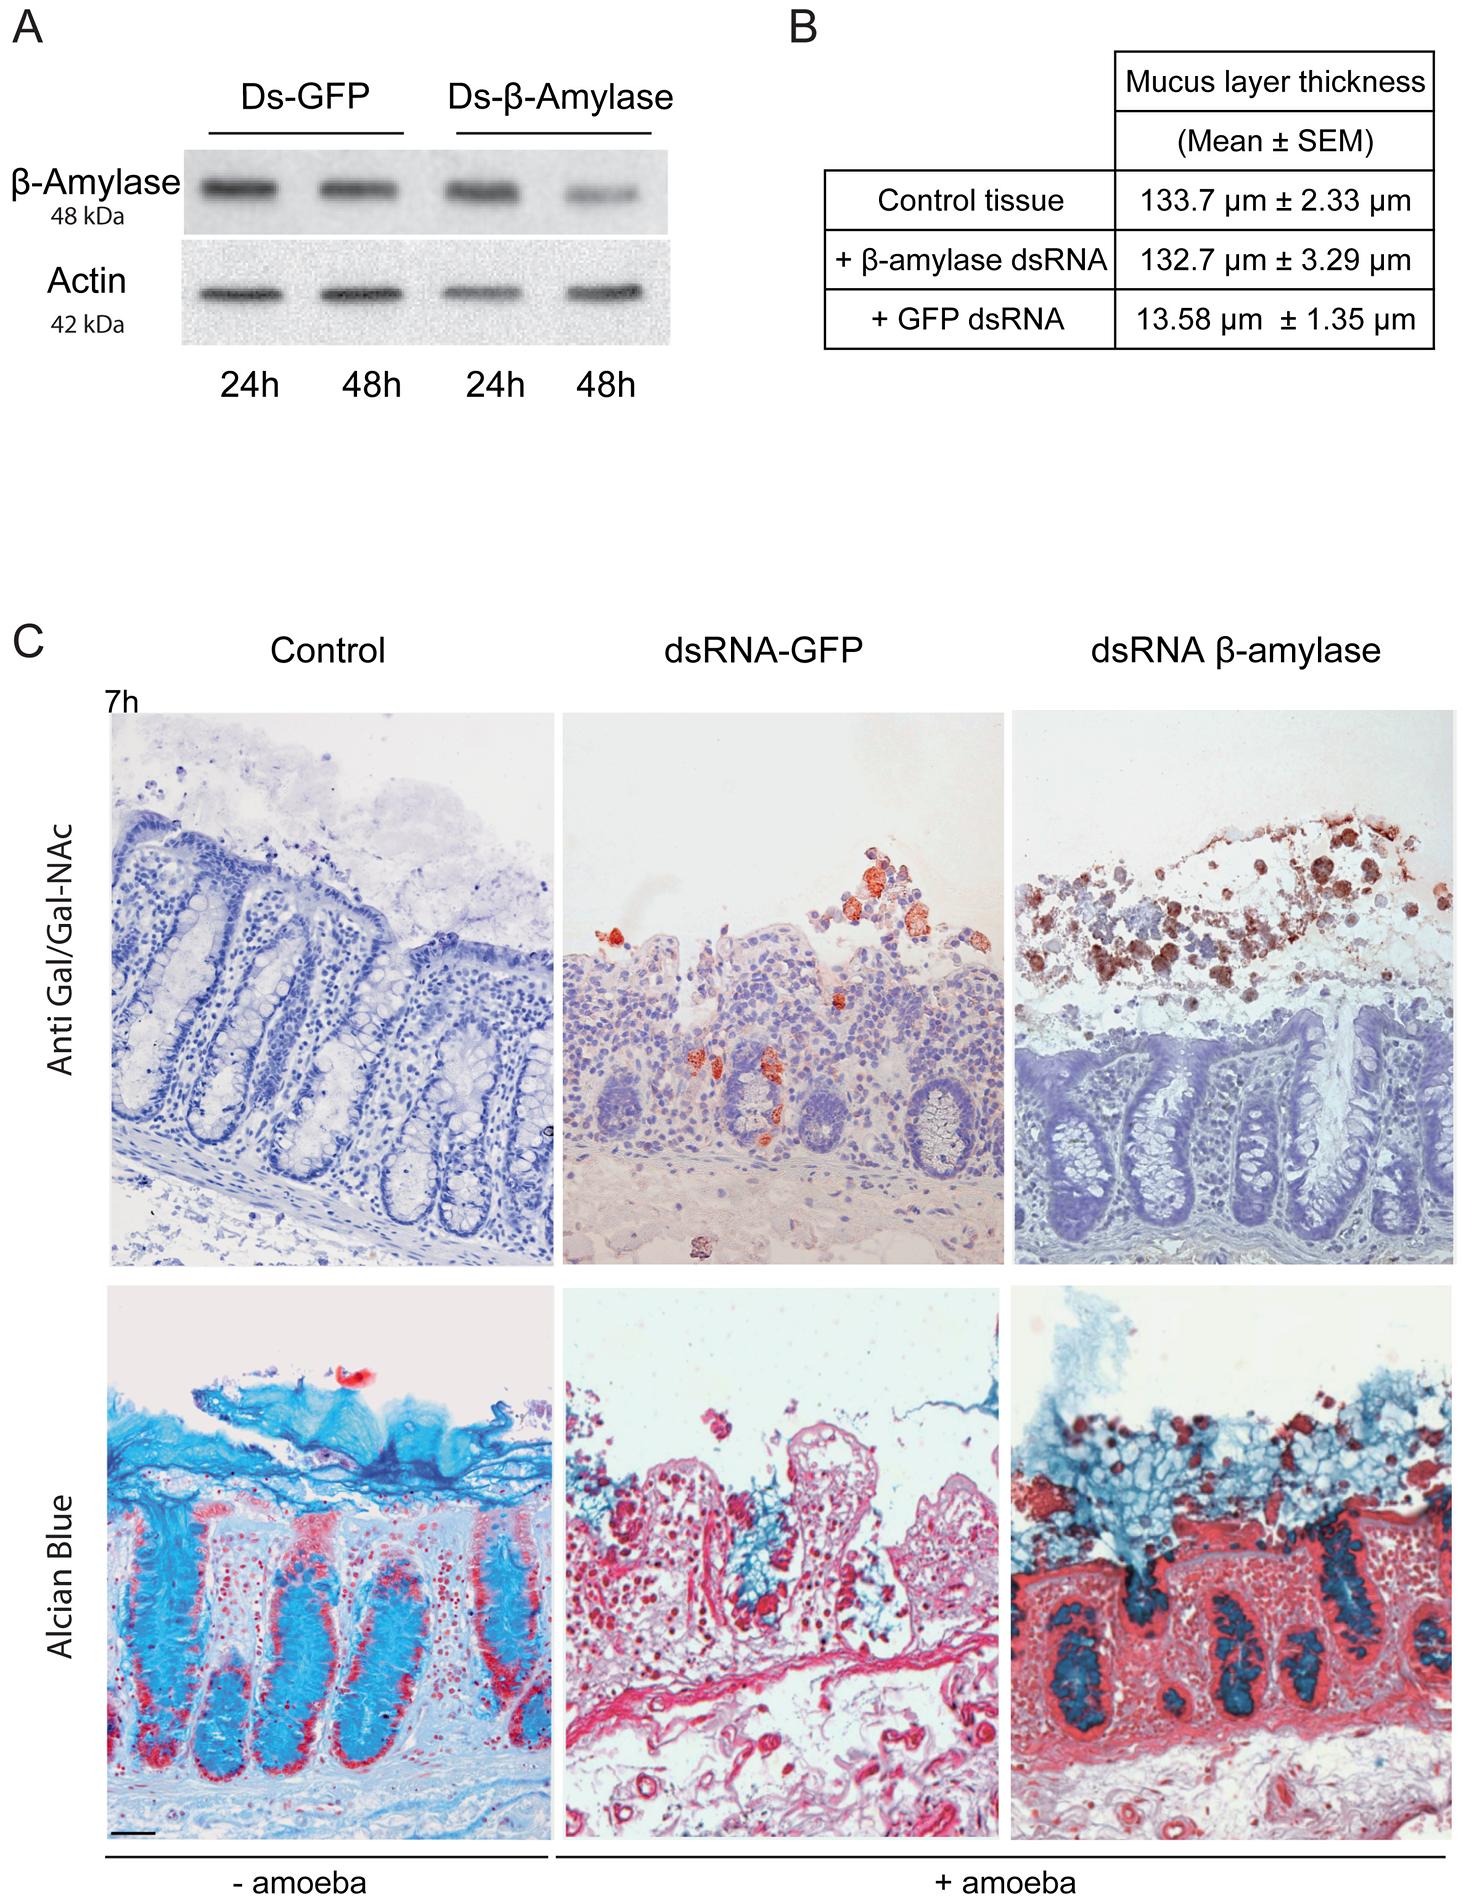 Depletion of ß-amylase in HM1:IMSS trophozoites prevent mucus layer degradation.